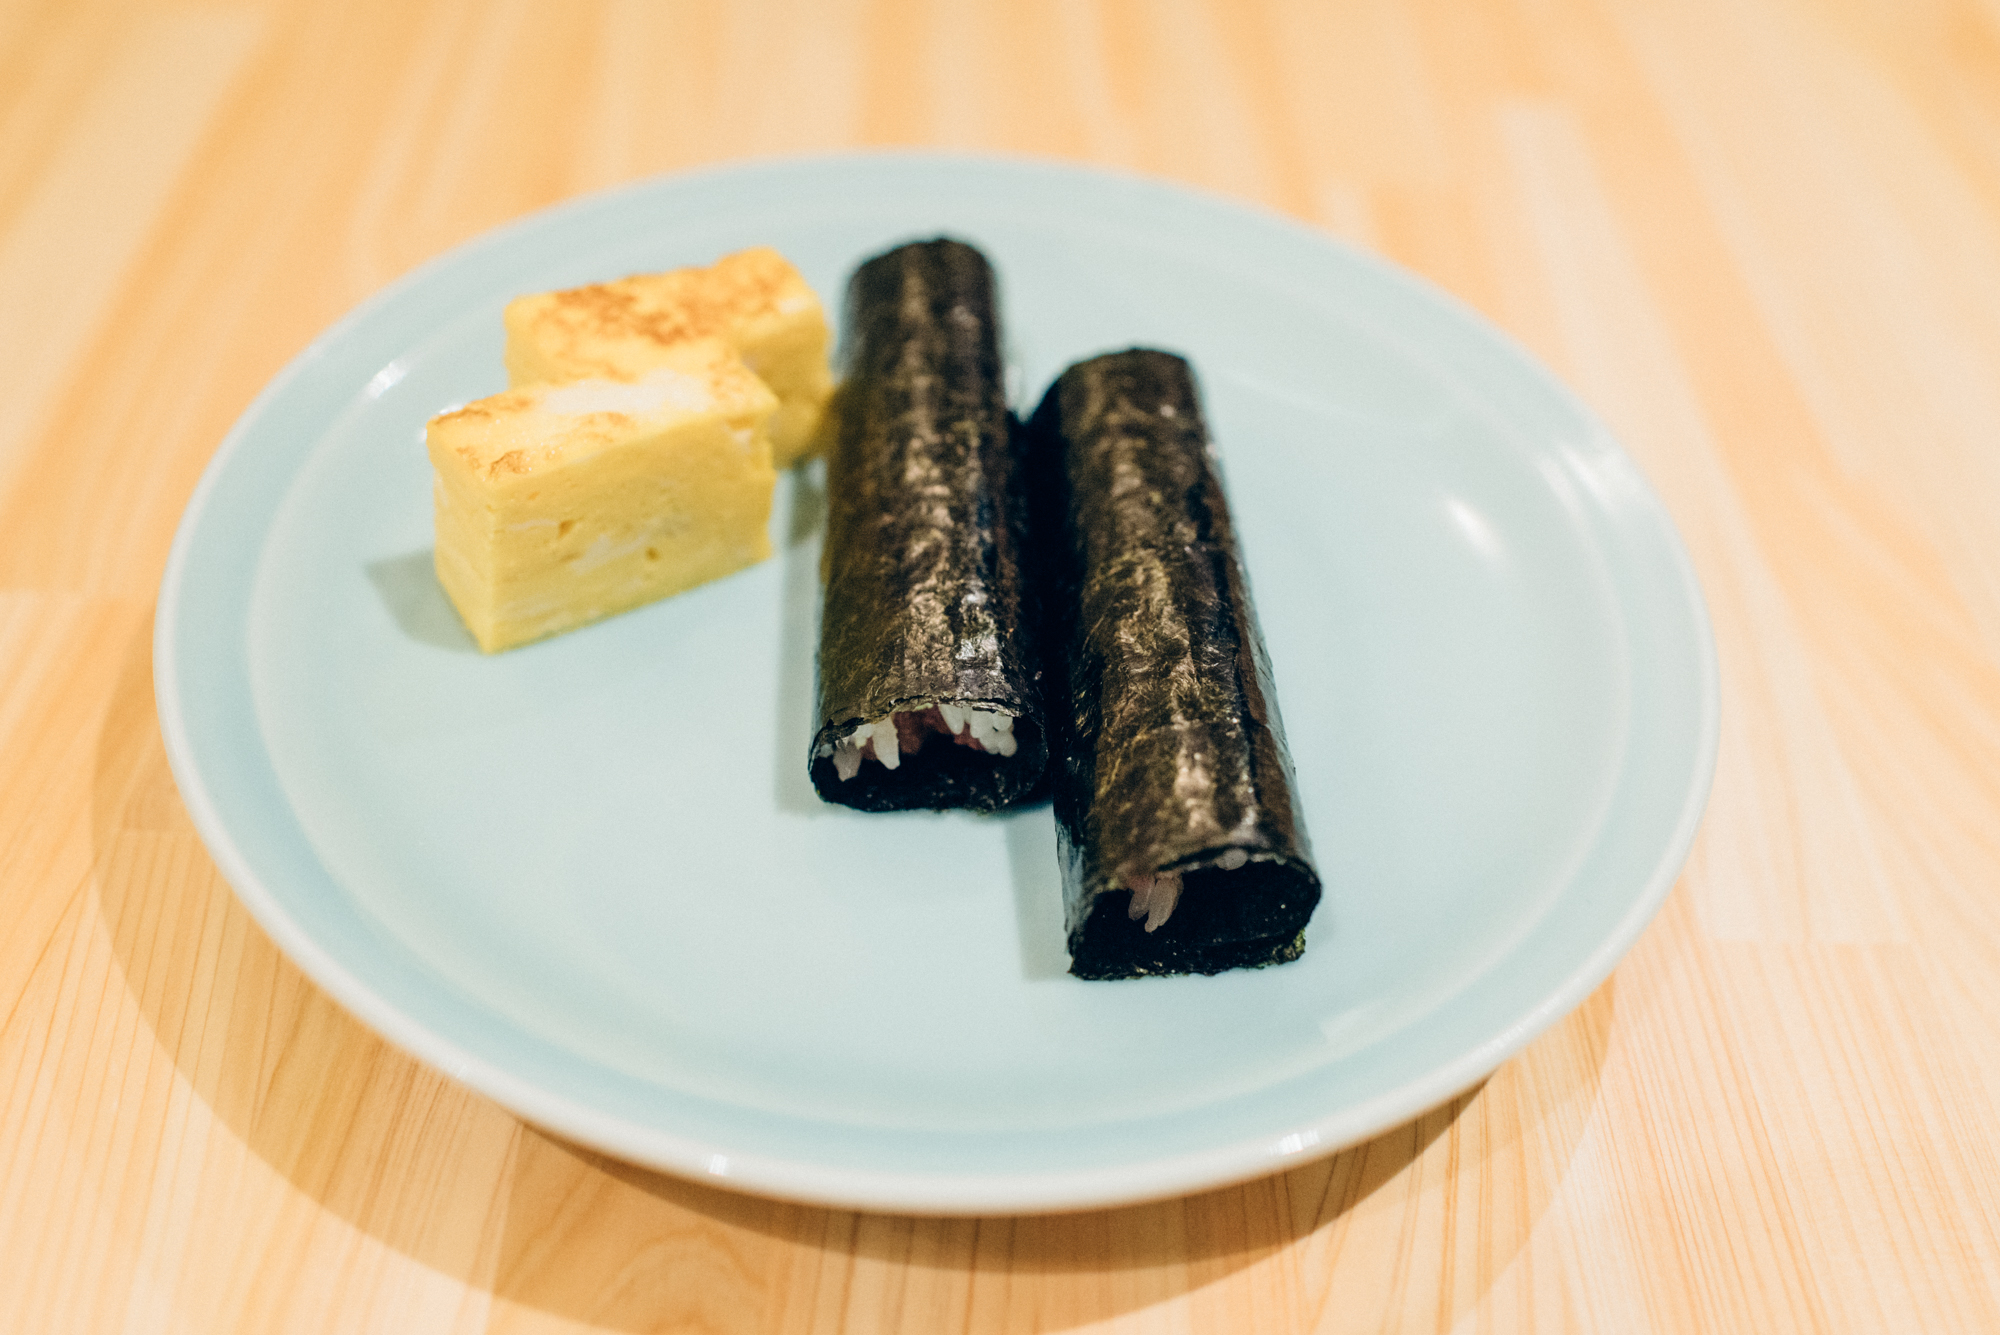 toronto-omakase-sushi-shoushin-21.jpg